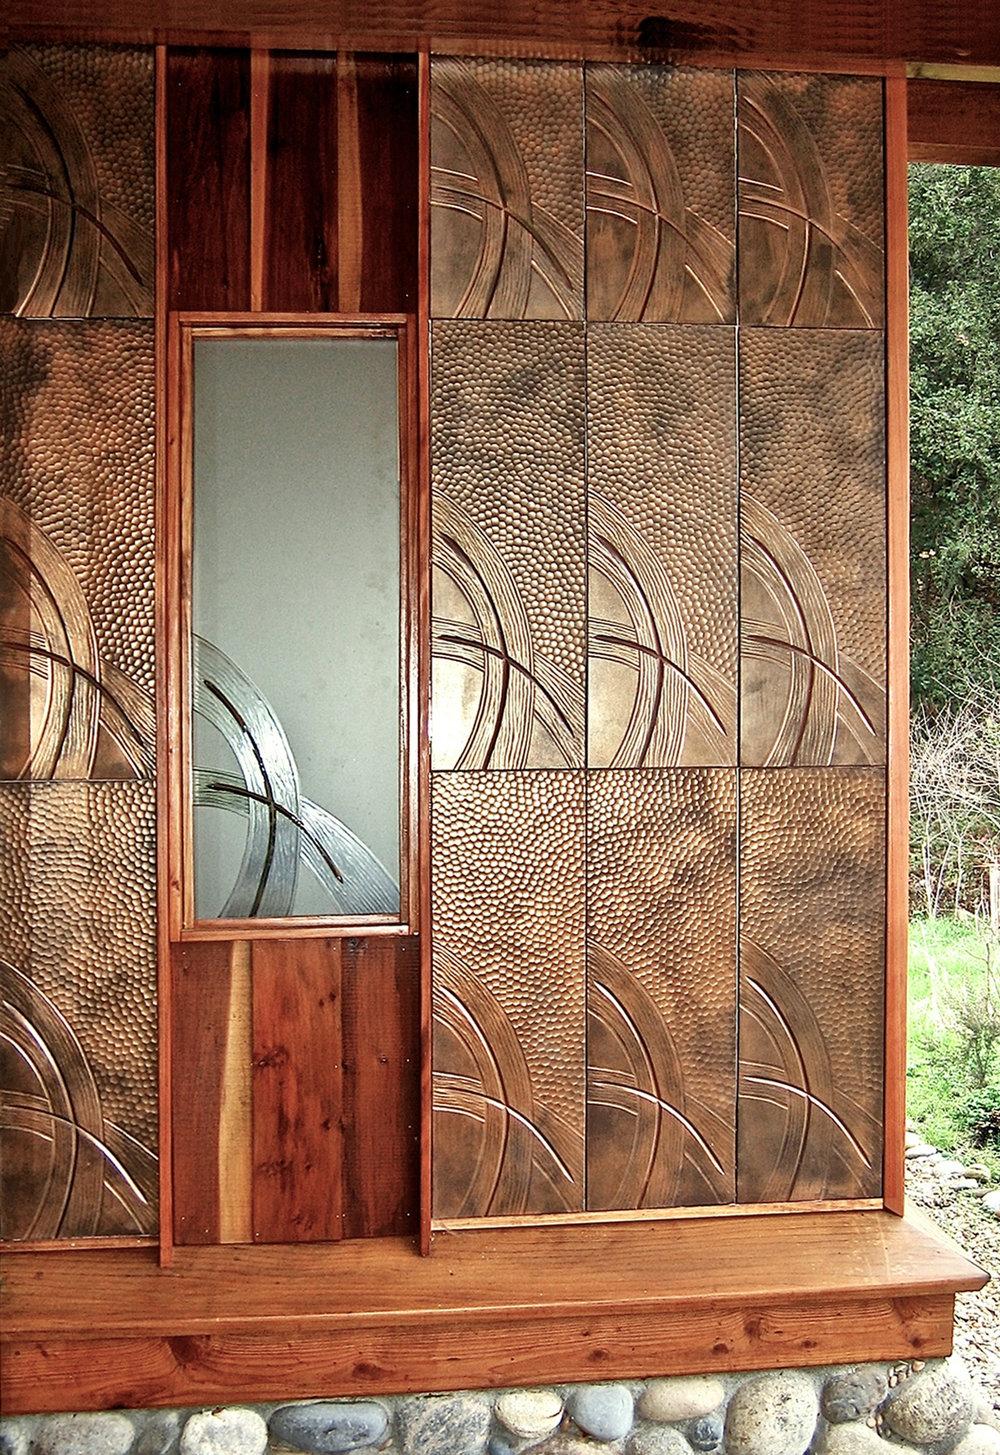 Shogun Feature Wall